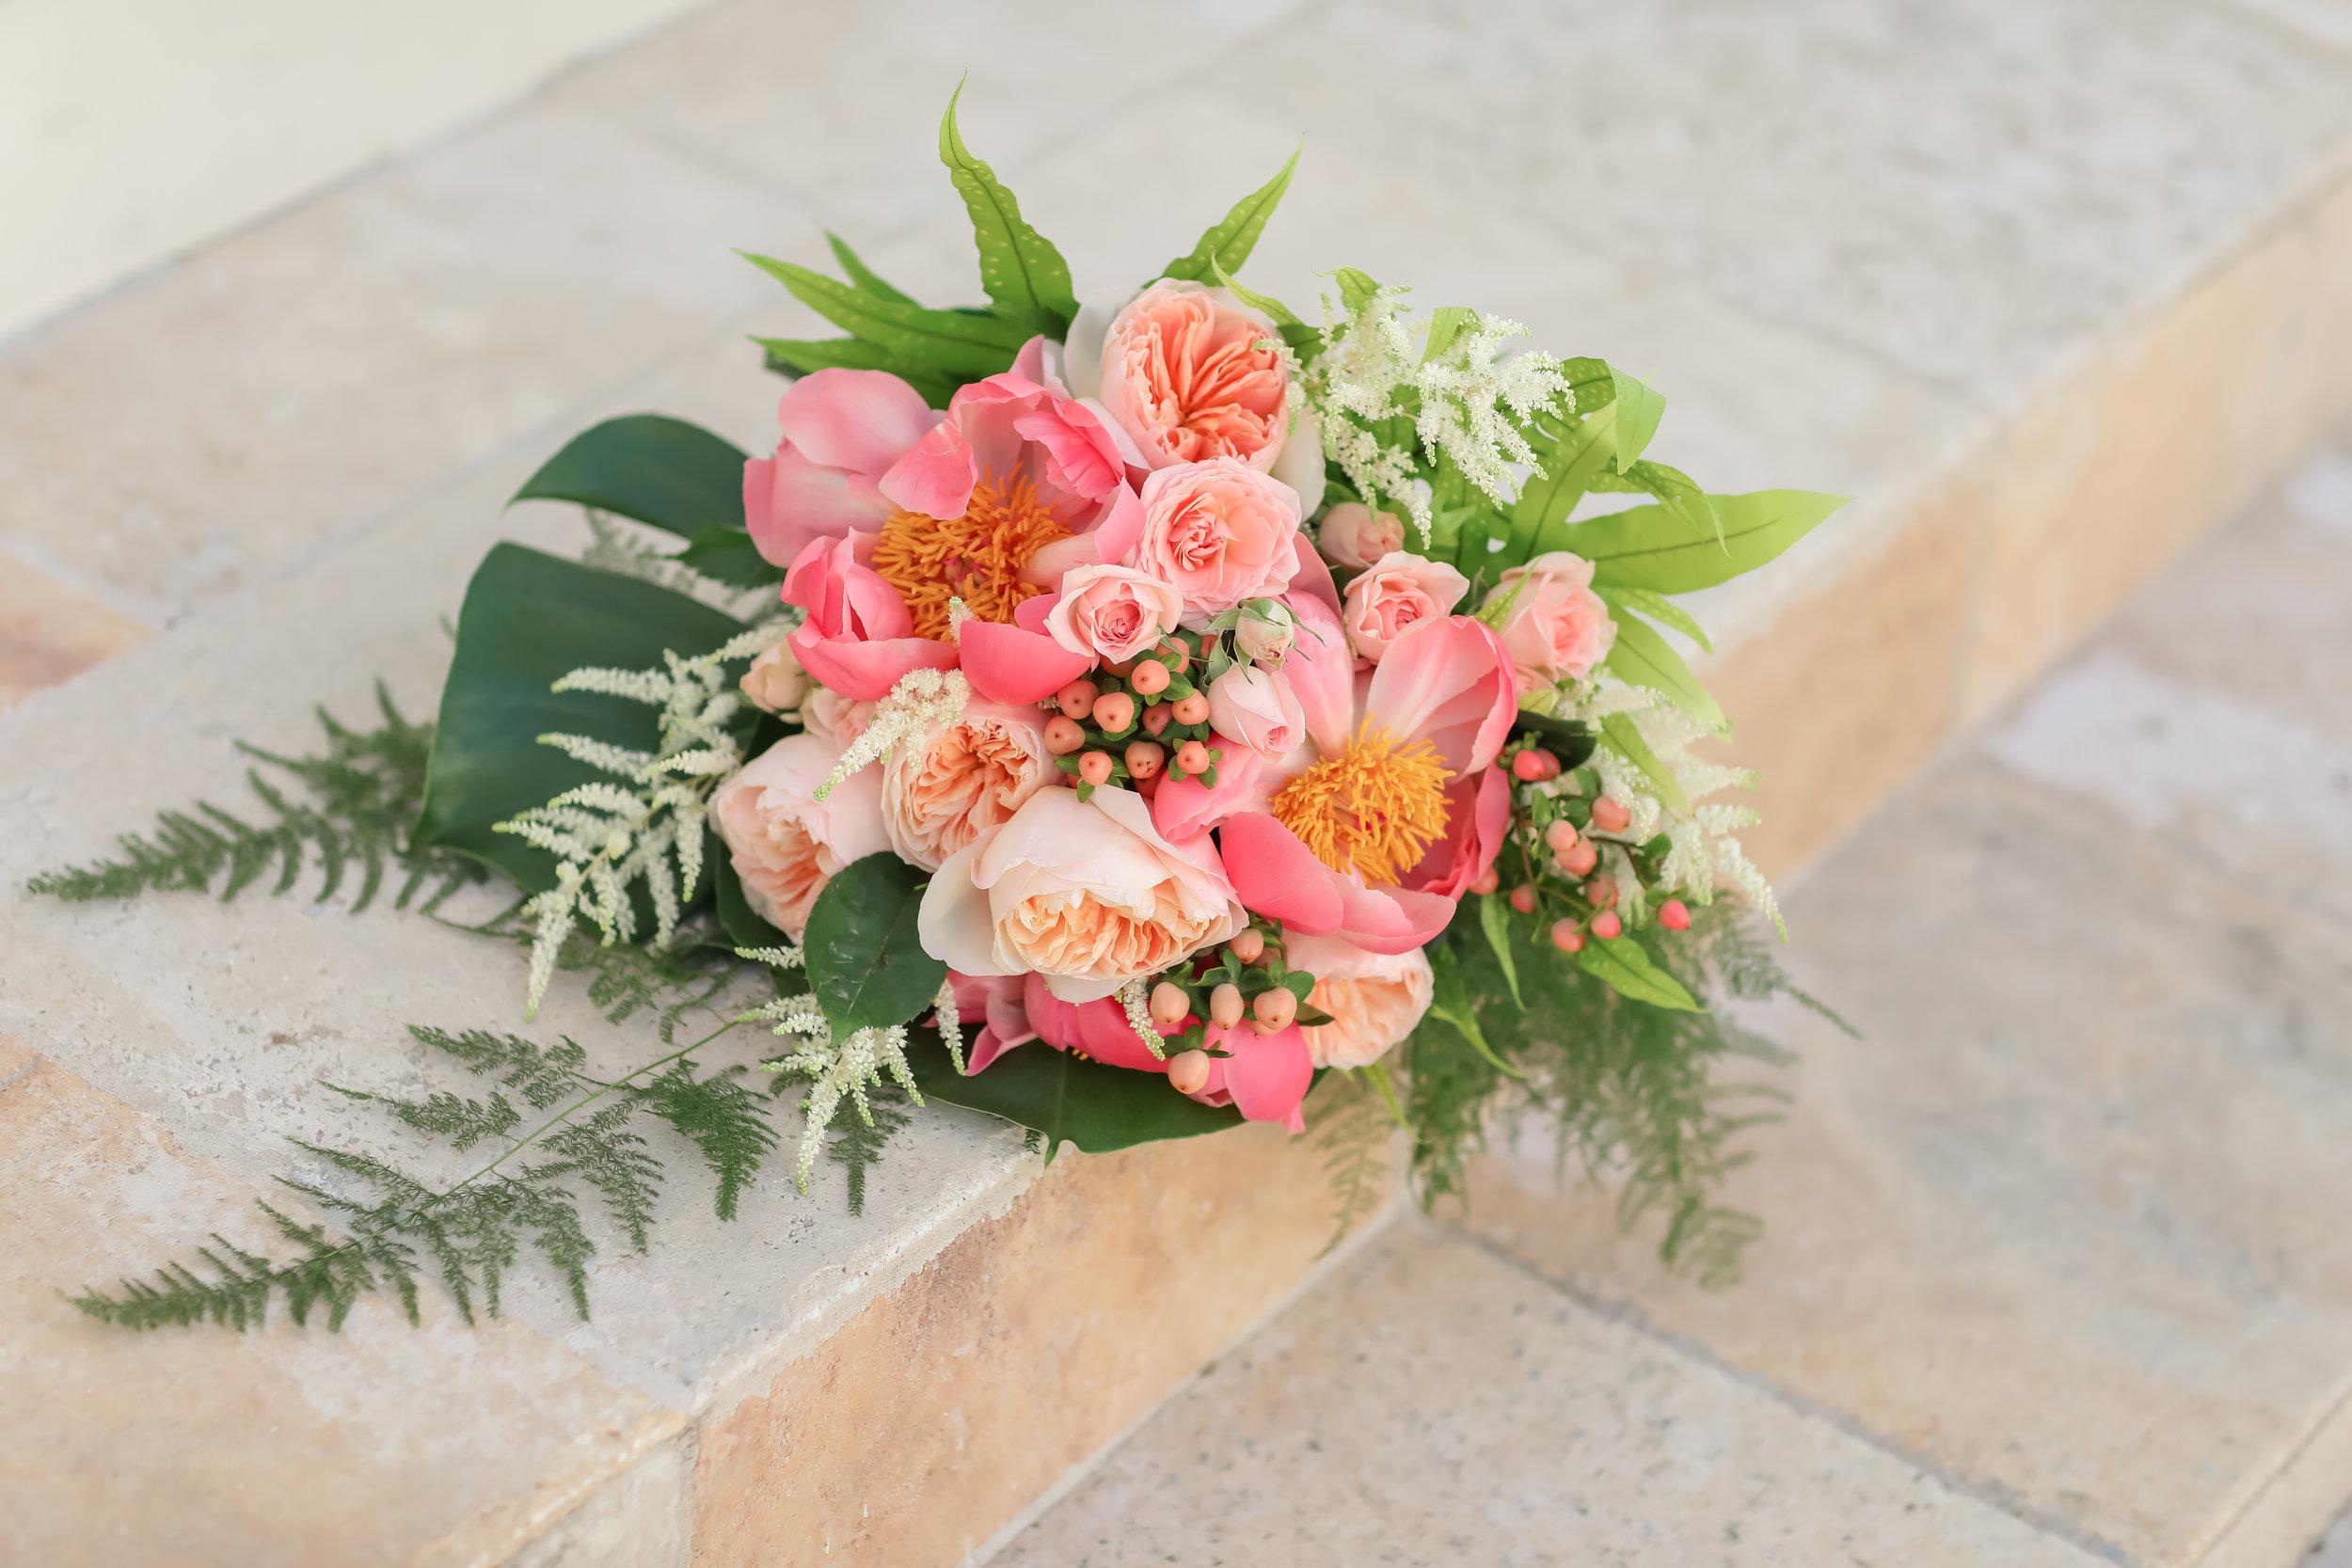 Do you have a modest wedding budget? -